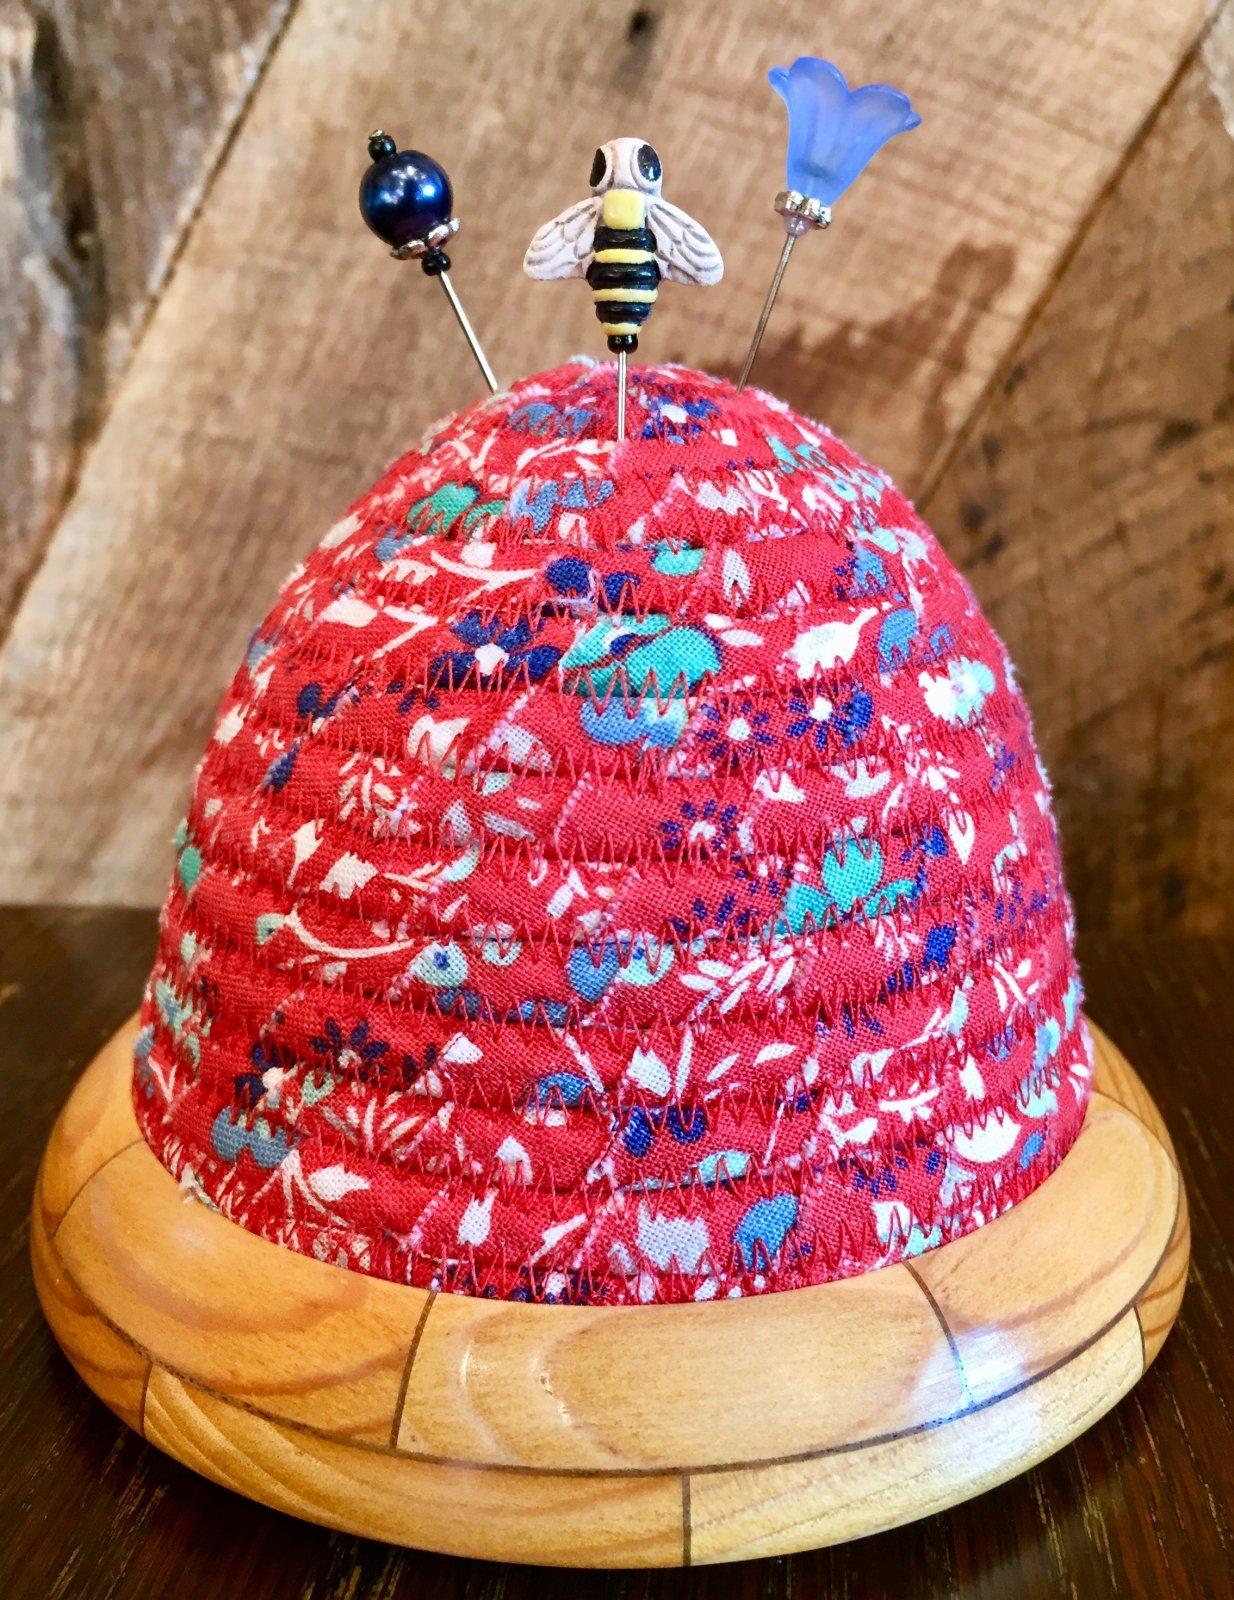 Beehive Pincushion - Backyard Blooms - Red Top - Spruce / Walnut Base